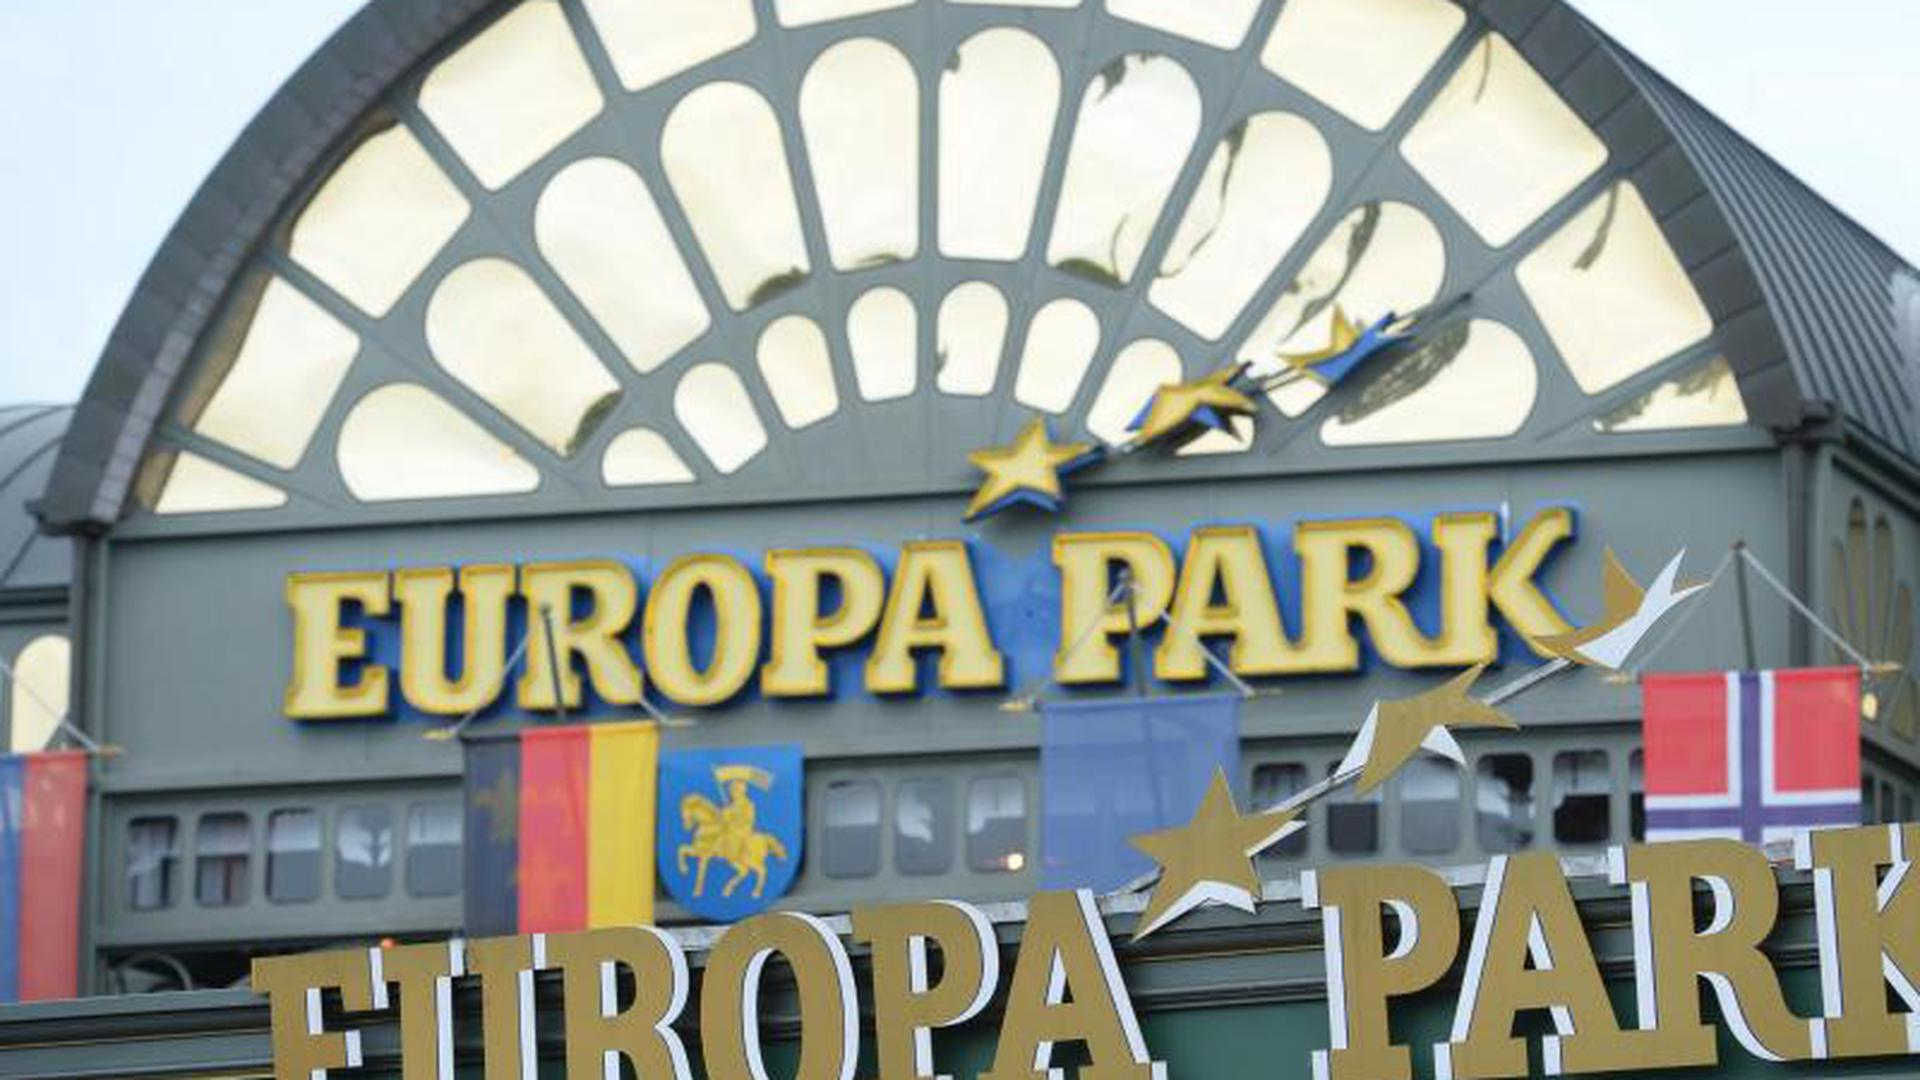 Europa-Park in Rust